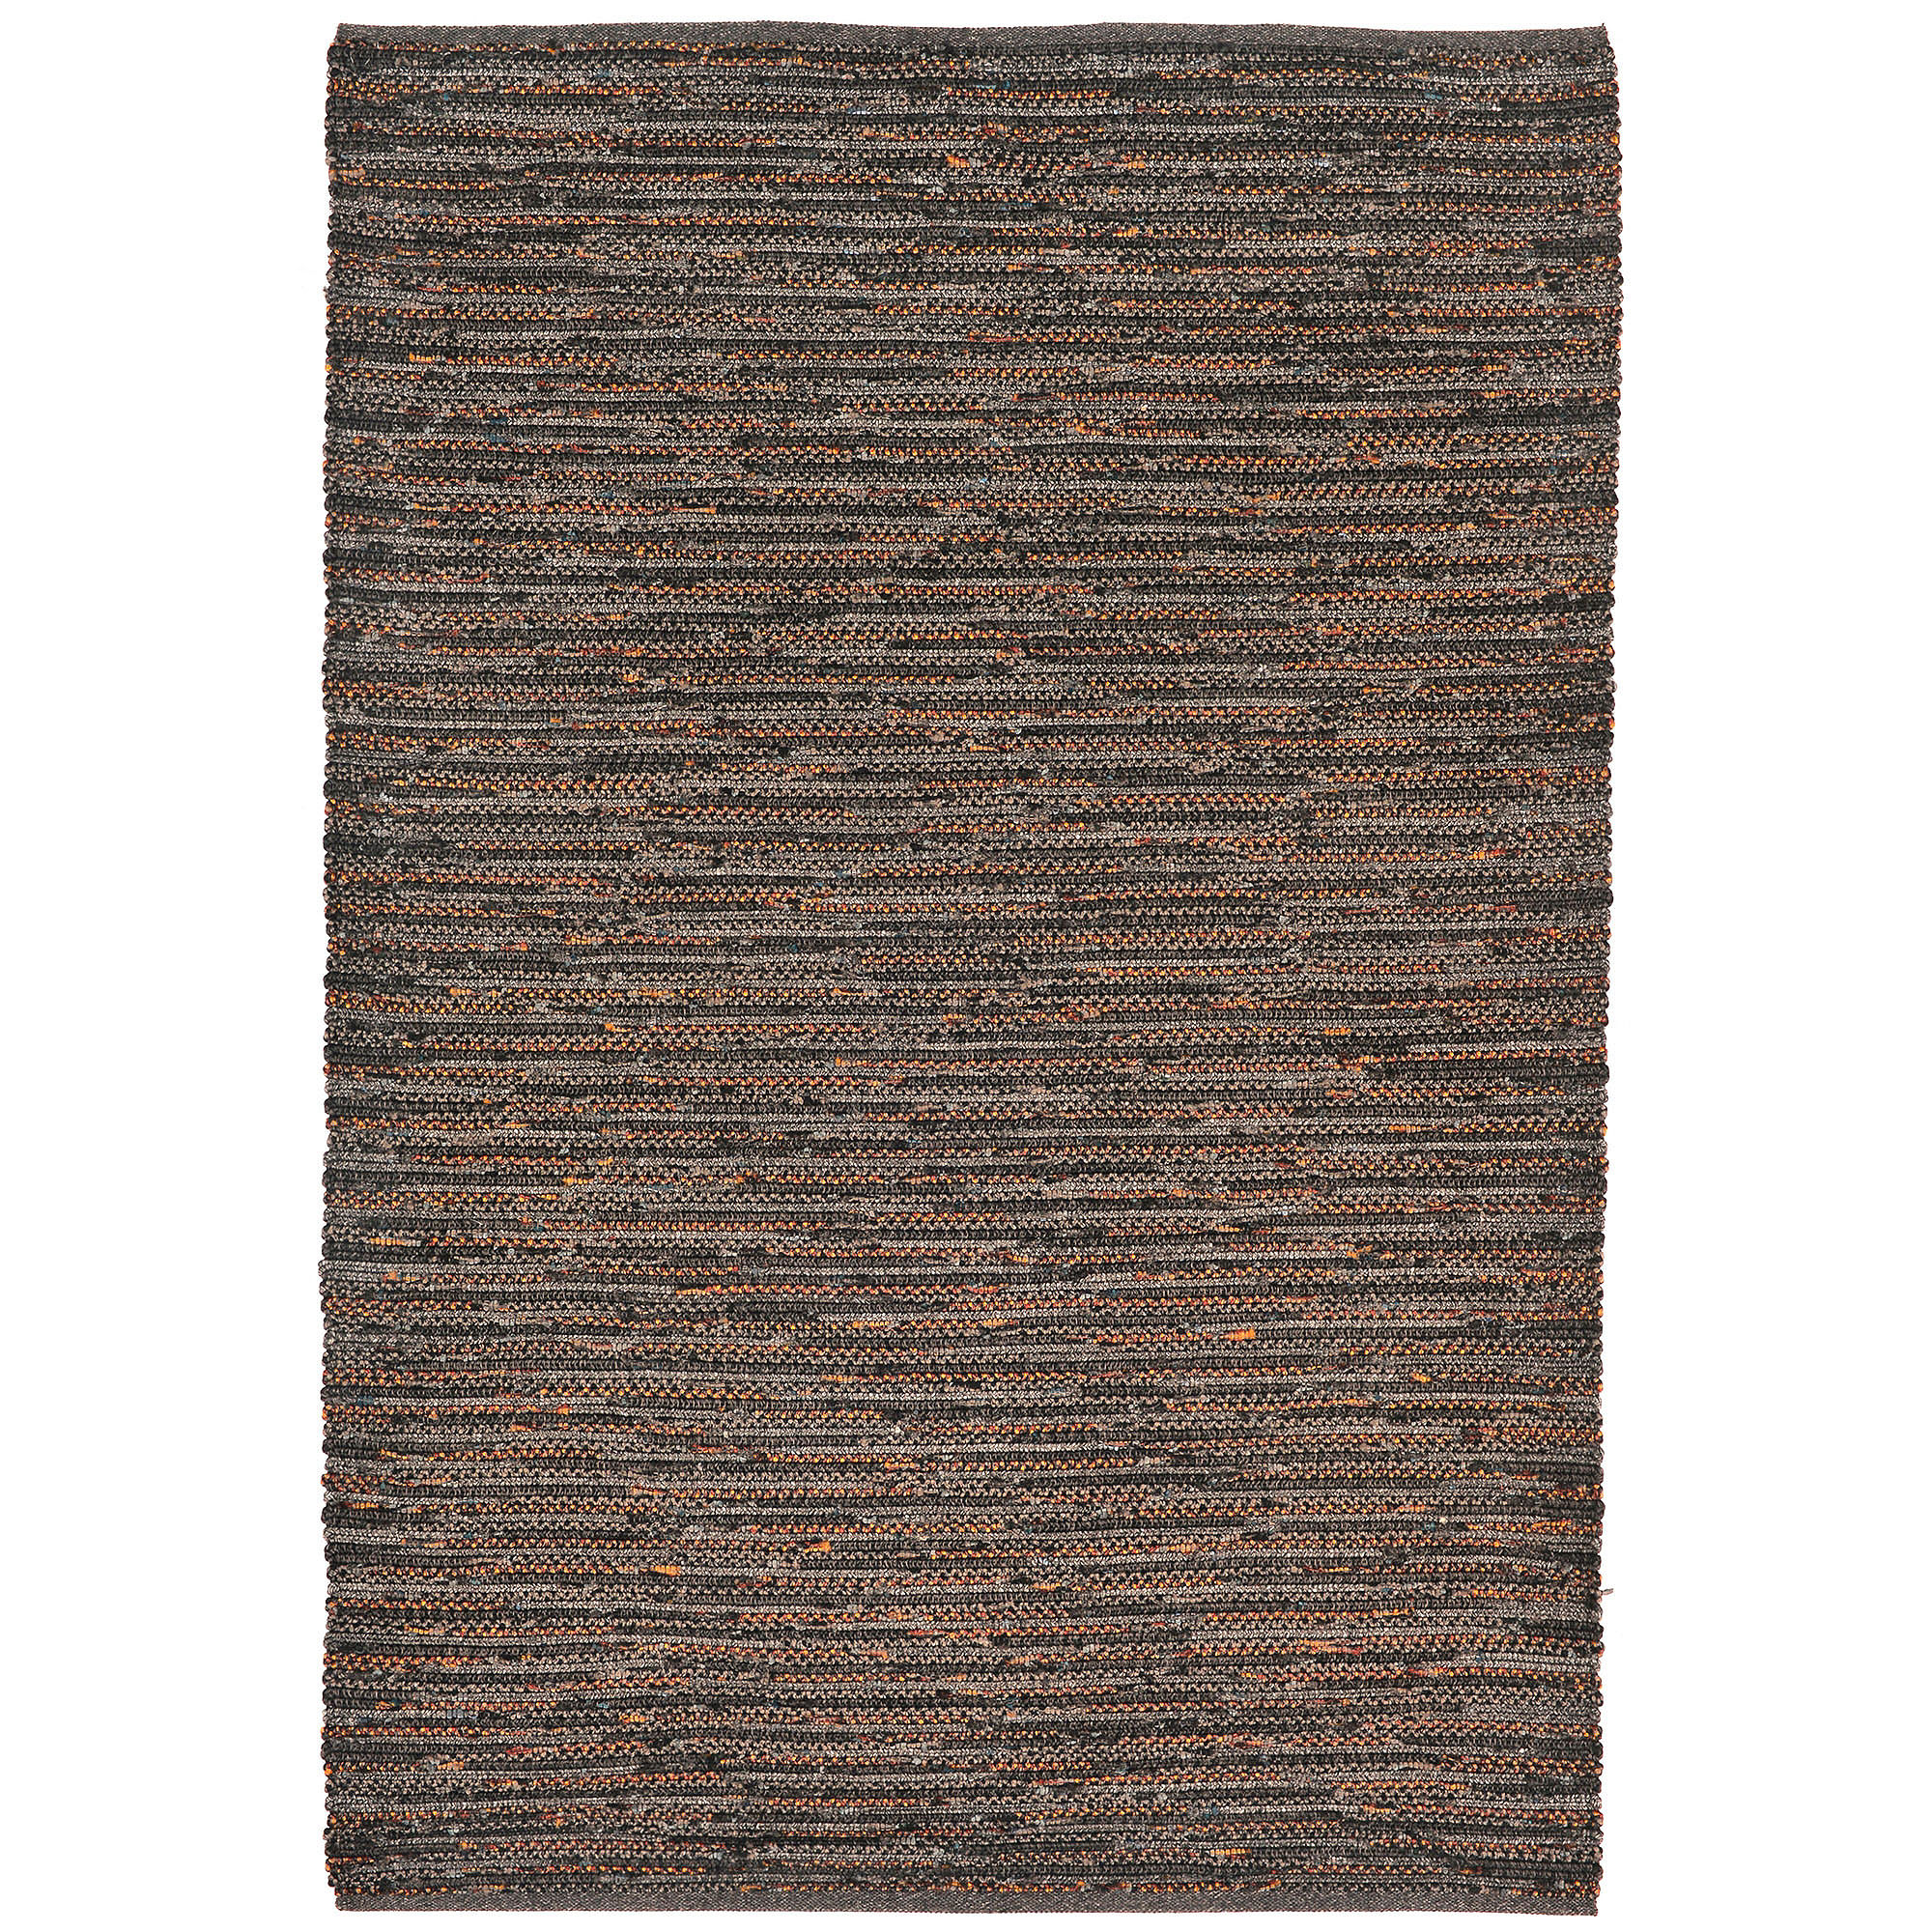 Liora Manne Sahara Plains Rectangular Rugs